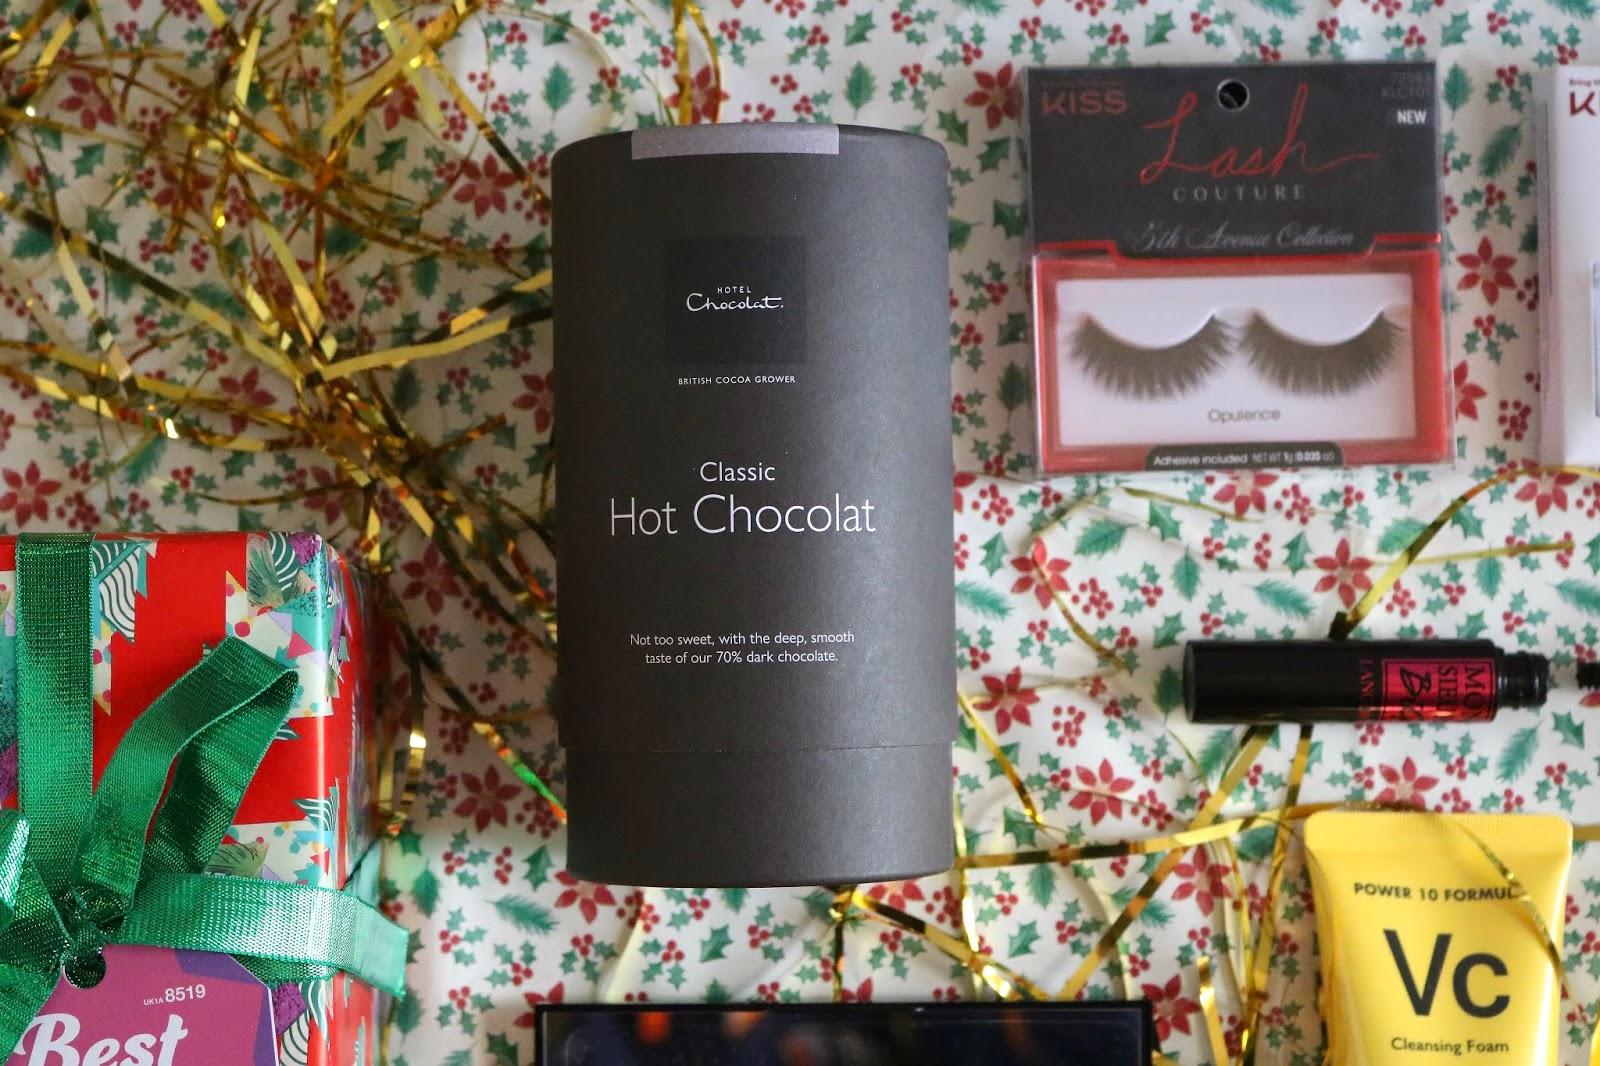 HOTEL CHOCOLAT CLASSIC DRINKING HOT CHOCOLAT £9